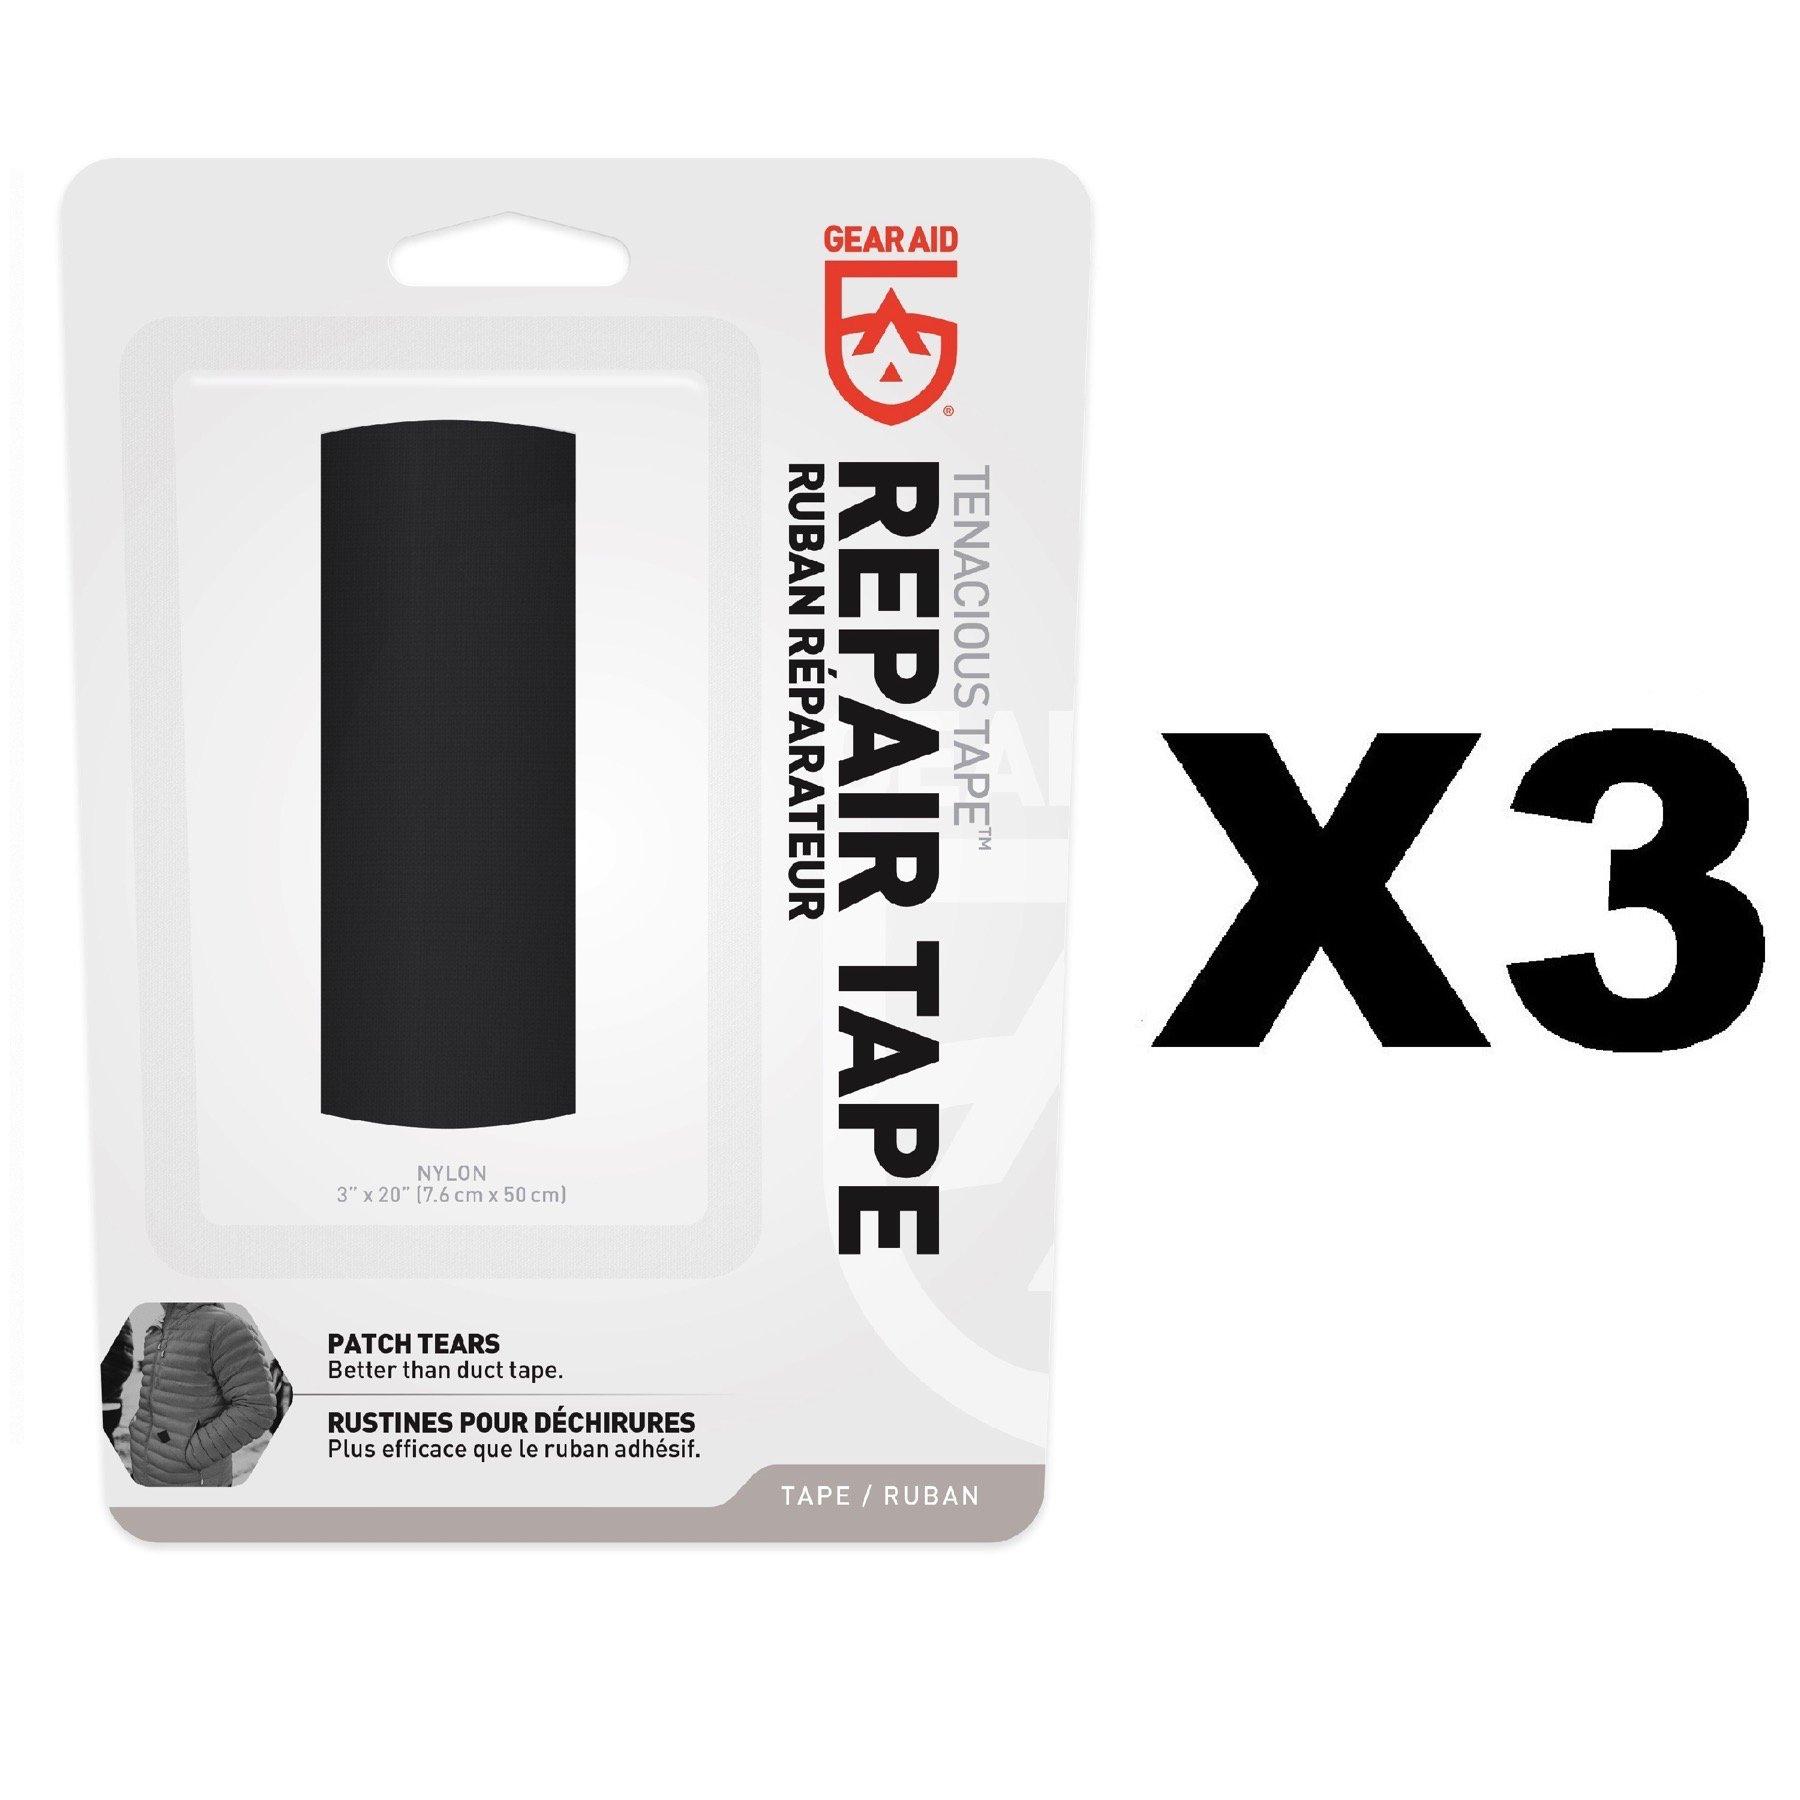 Gear Aid McNett Tenacious Tape Black Ultra Strong Outdoor Repair Tape (3-Pack)